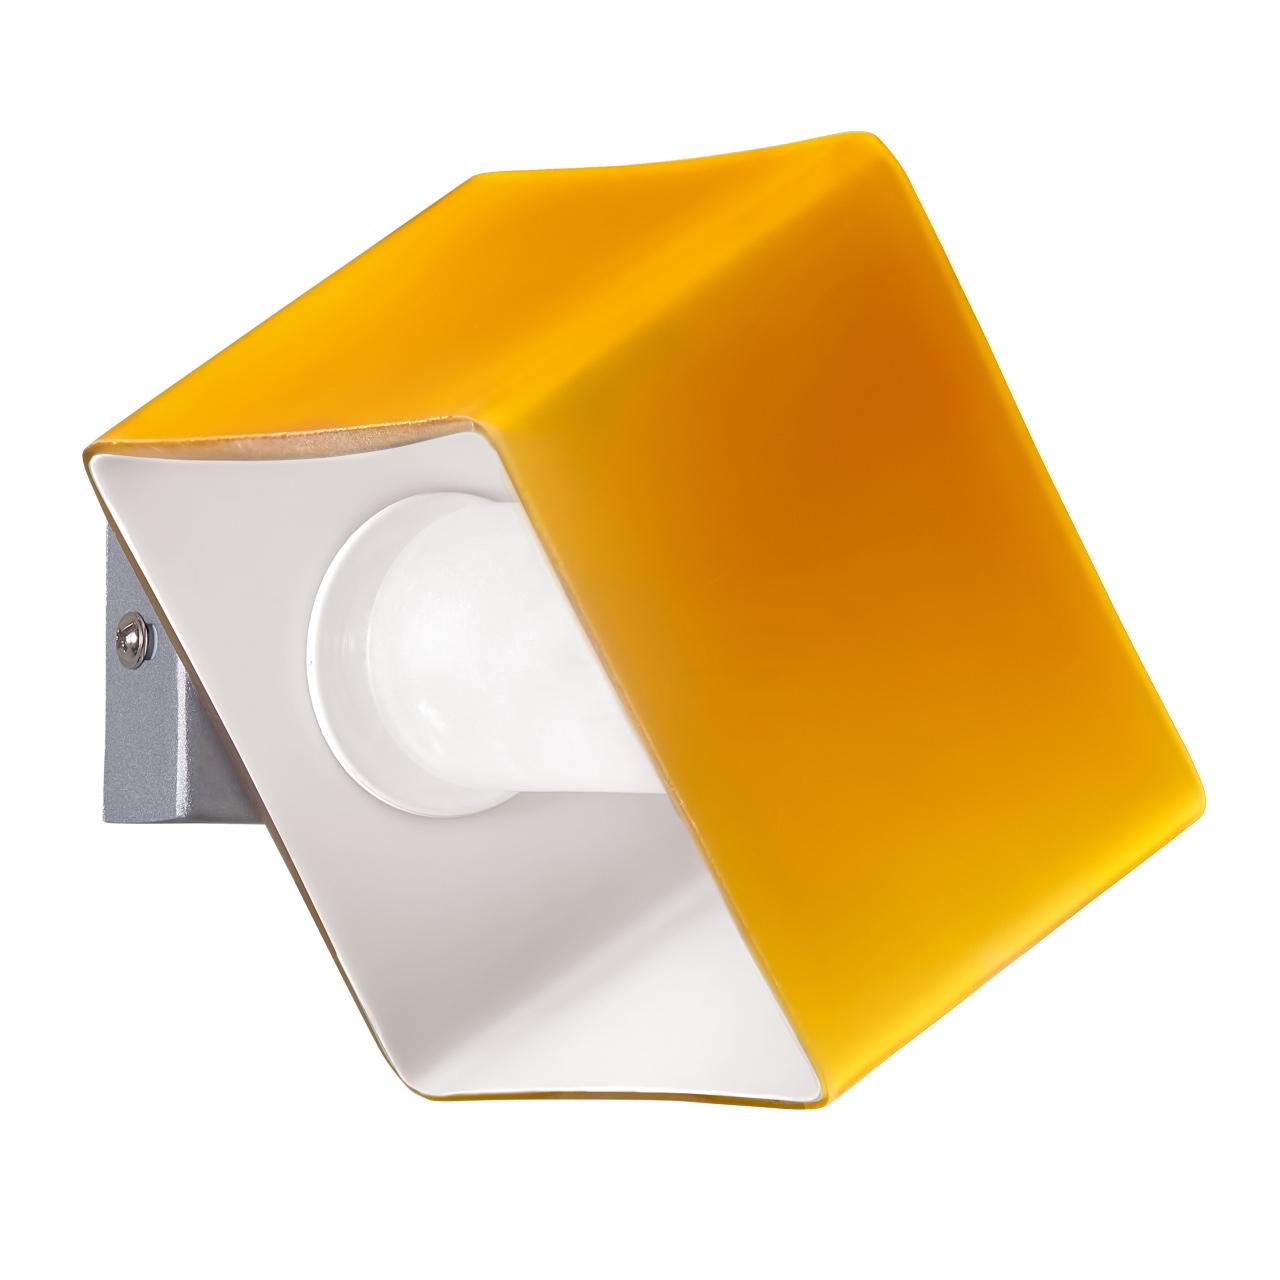 Светильник настенный Pezzo 1х40W G9 хром / янтарь Lightstar 801613